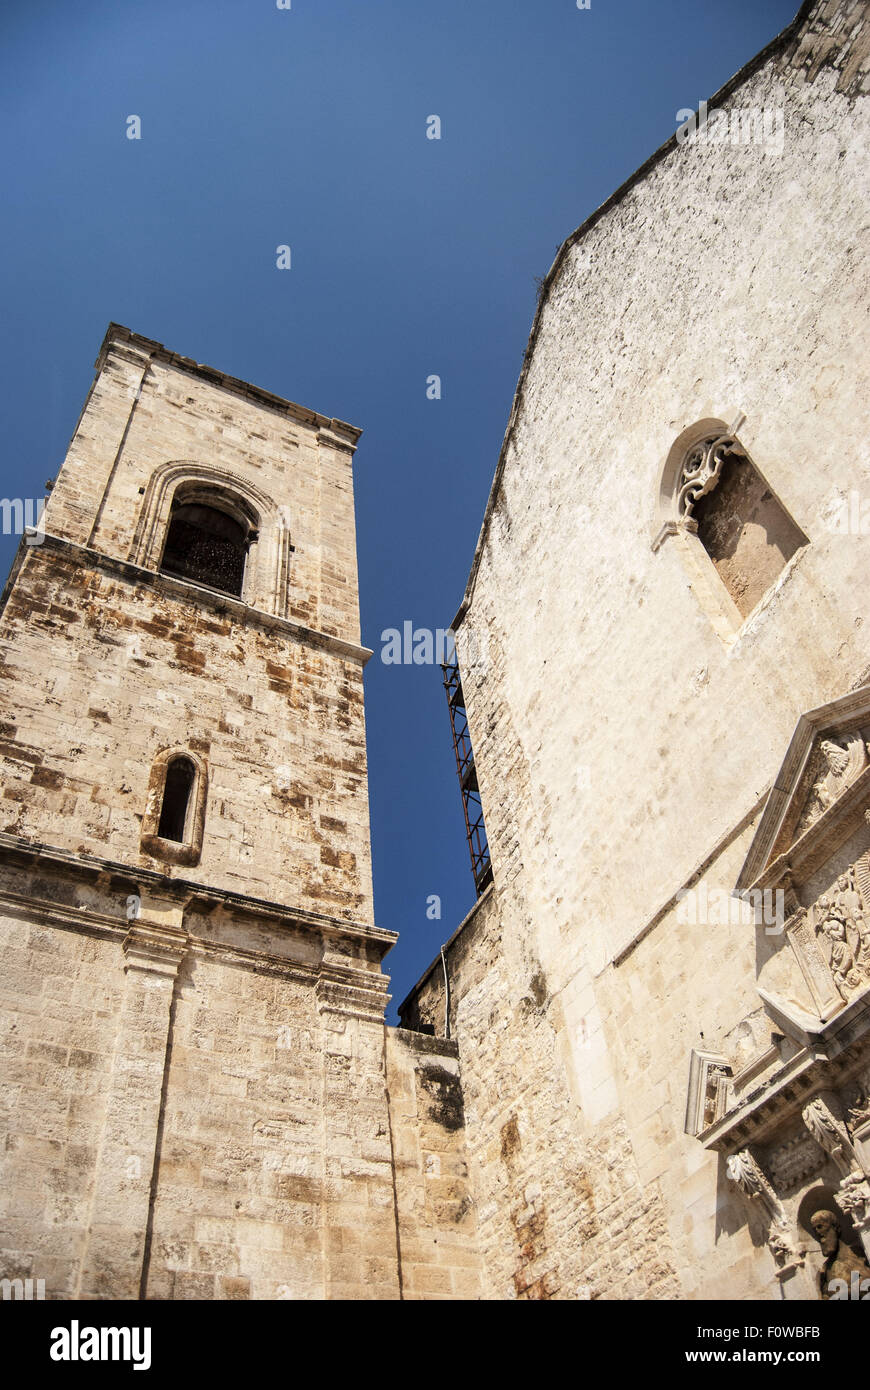 Chiesa matrice stock photos chiesa matrice stock images alamy - Specchia polignano a mare ...